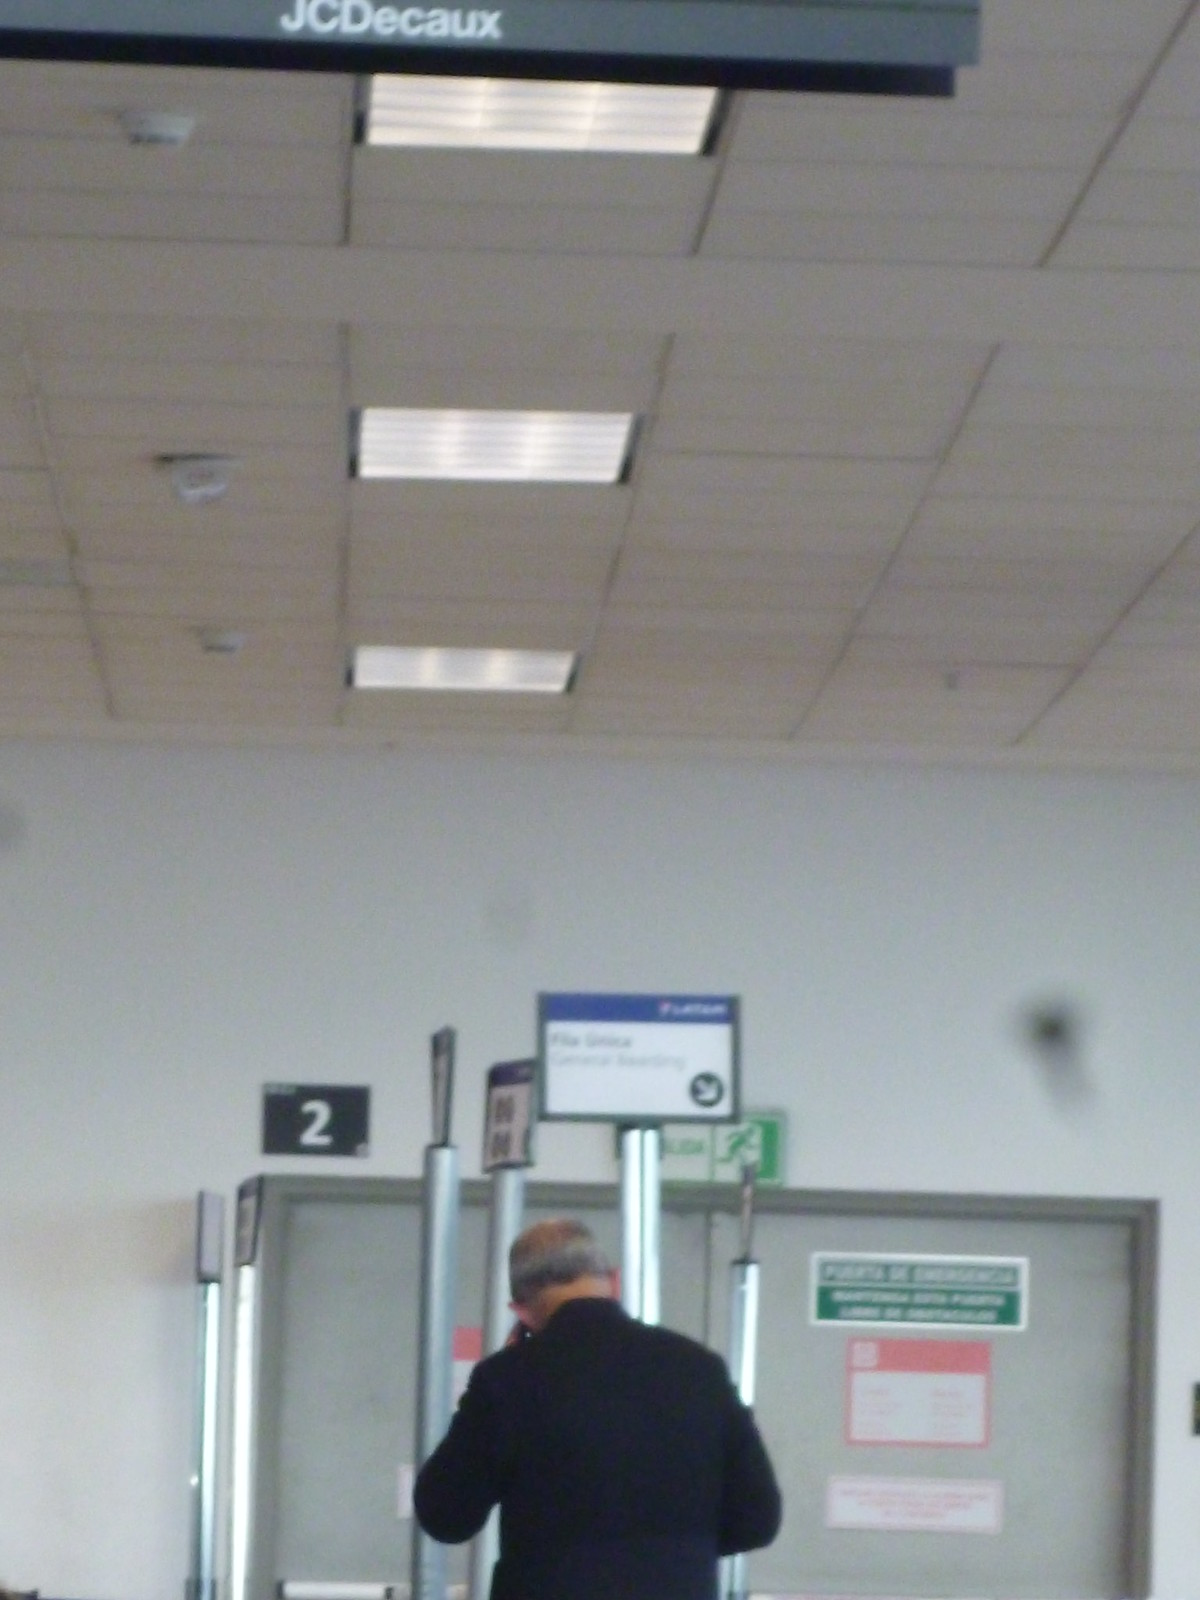 Sacerdote en aeropuerto, Panasonic DMC-S2